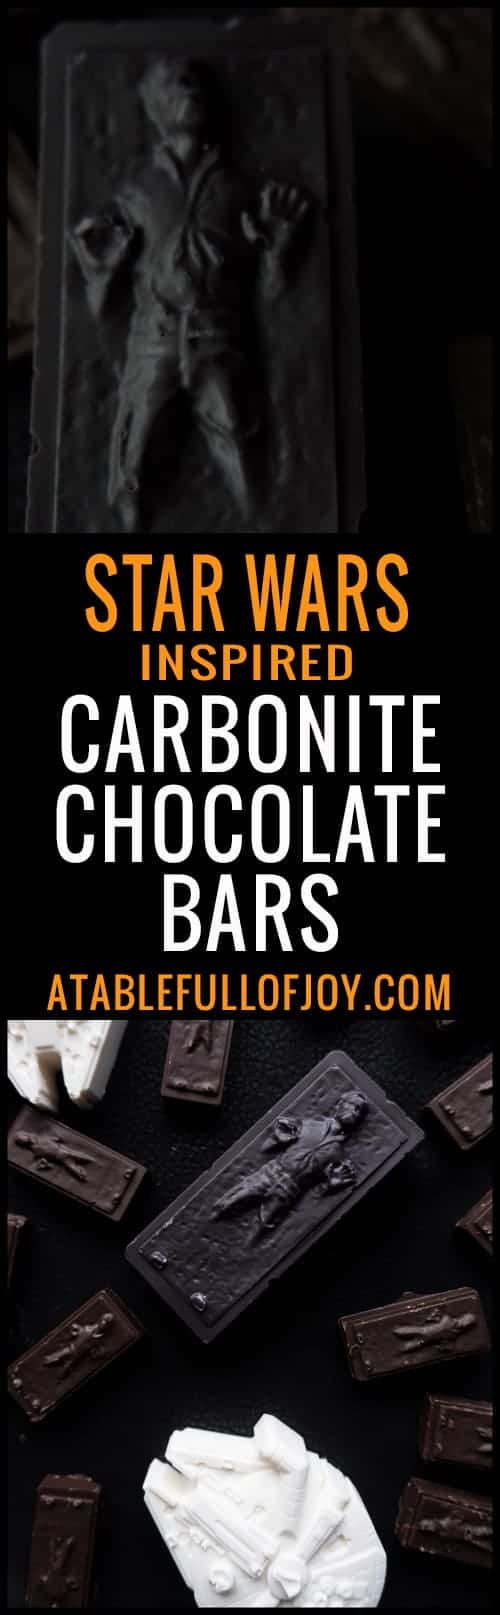 Star Wars Chocolate Bars